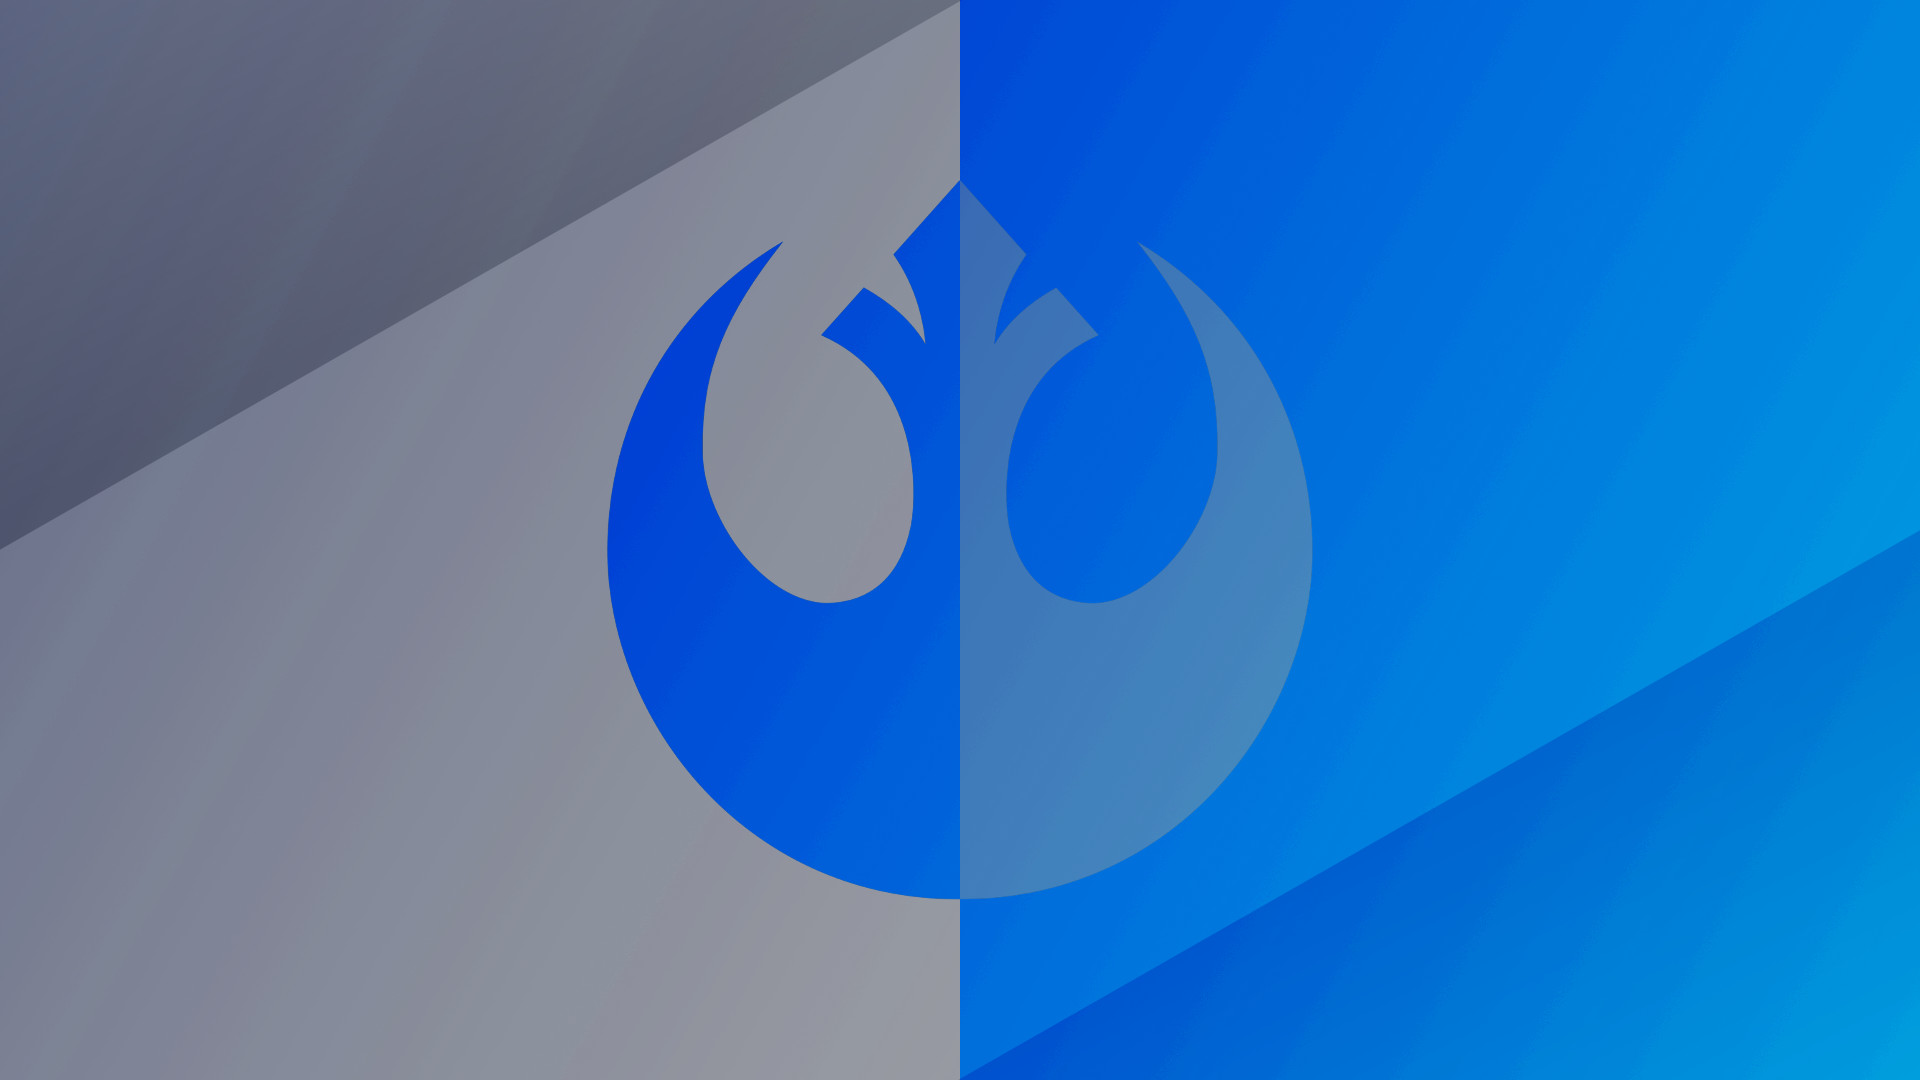 Star Wars Rebels Wallpaper (Blue)